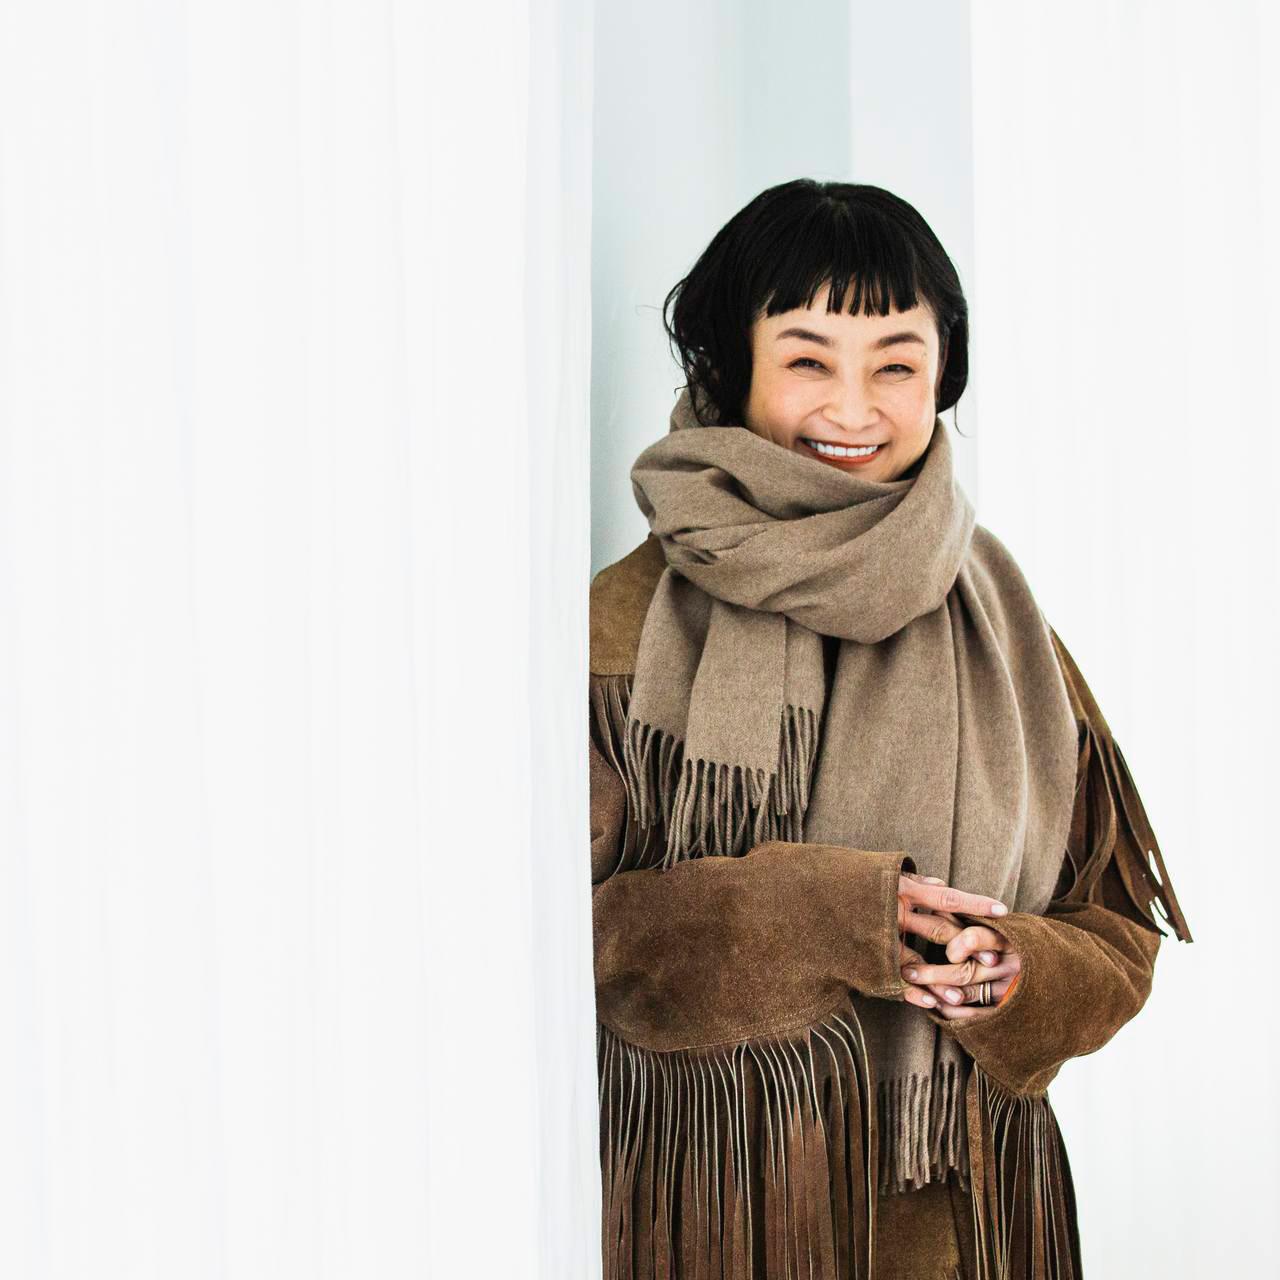 Street Style Photographer / Journalist シトウレイさん